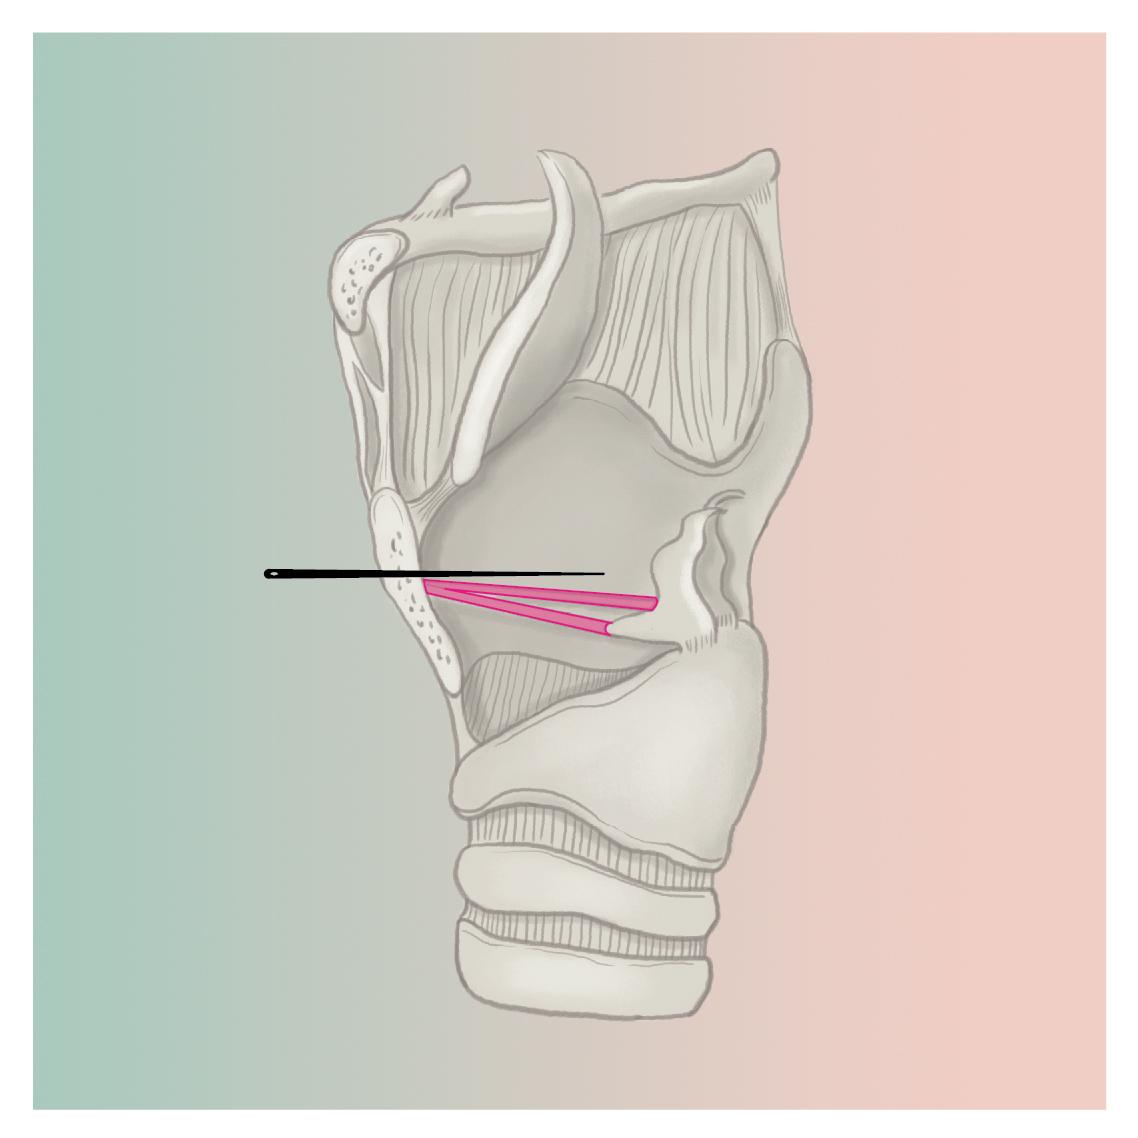 2passclinic before and after transwomen facial feminization FFS mtf antwerp tracheal shave